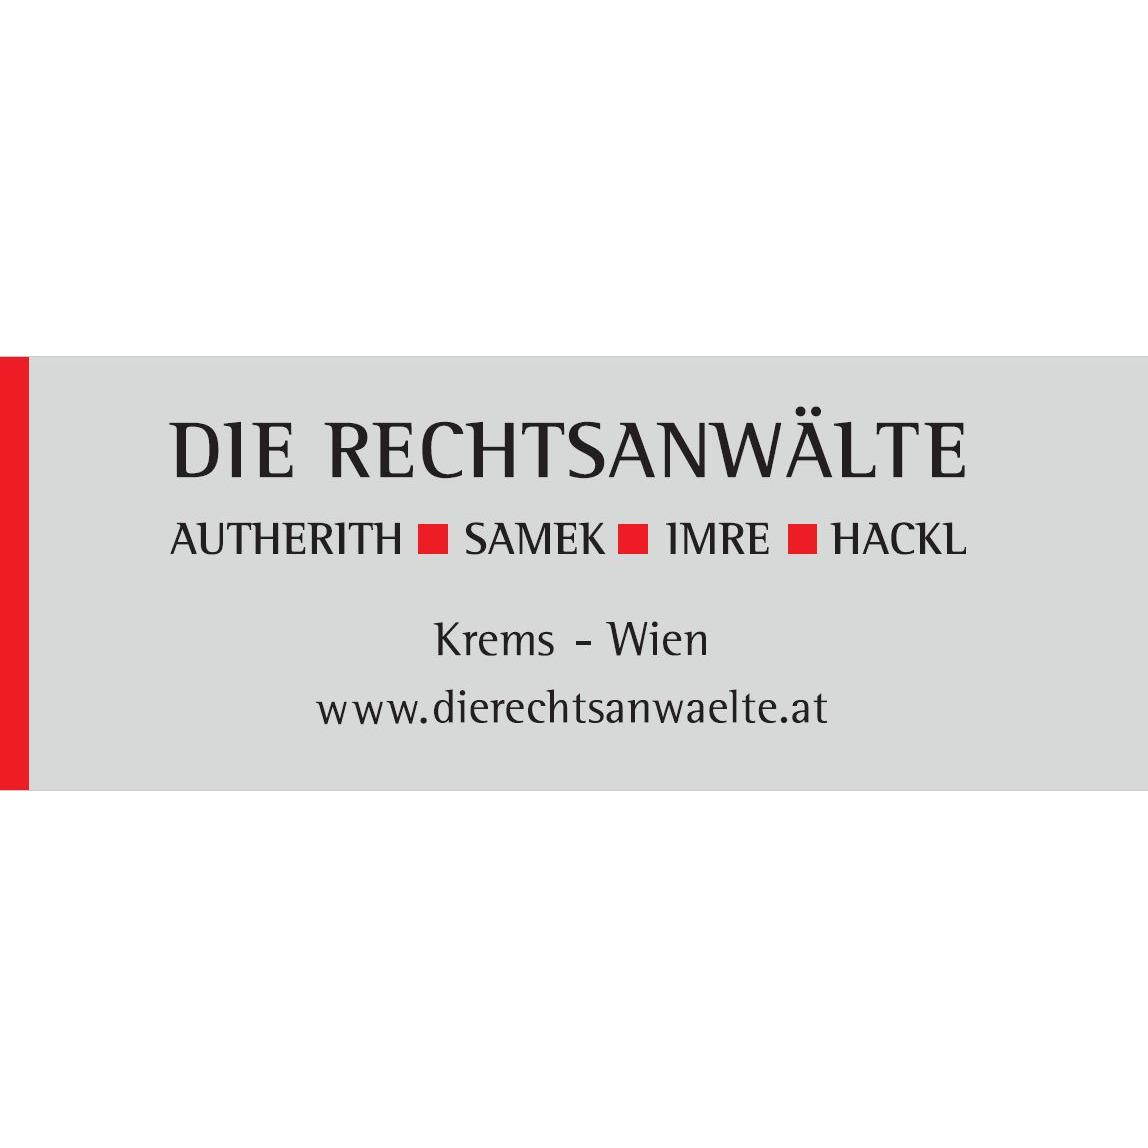 Die Rechtsanwälte Autherith - Samek - Imre - Hackl